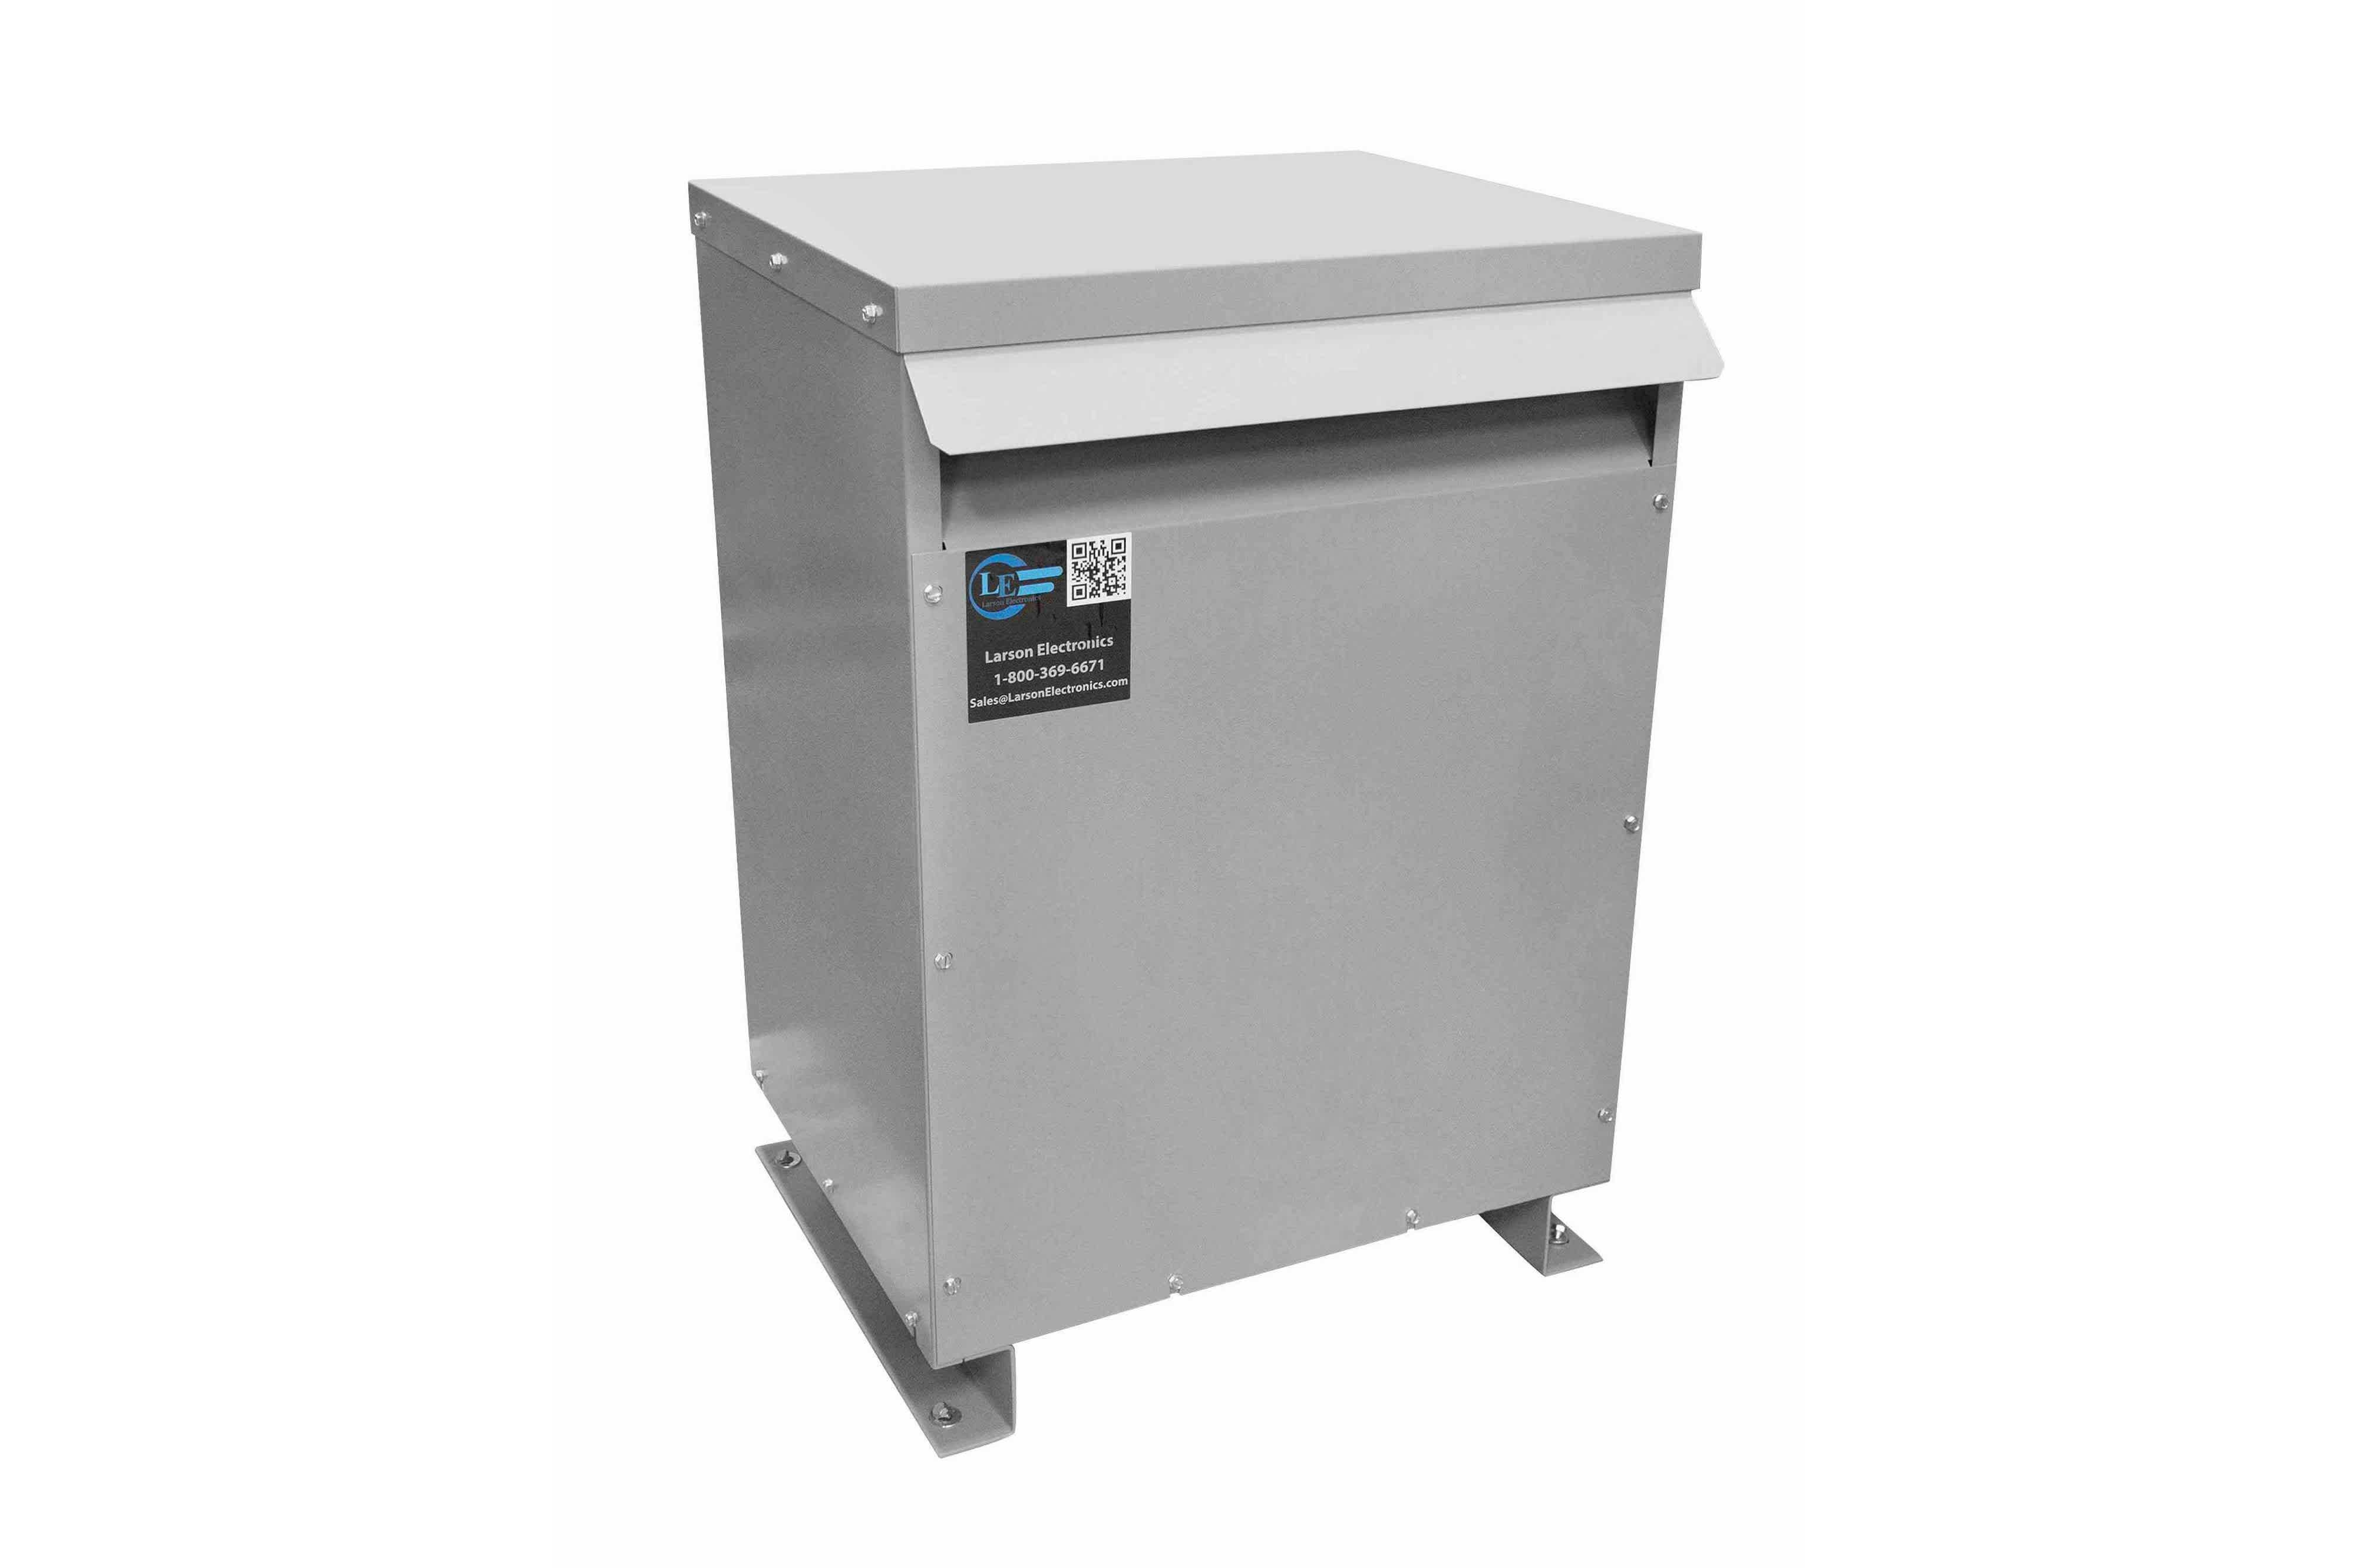 28 kVA 3PH Isolation Transformer, 480V Wye Primary, 208Y/120 Wye-N Secondary, N3R, Ventilated, 60 Hz